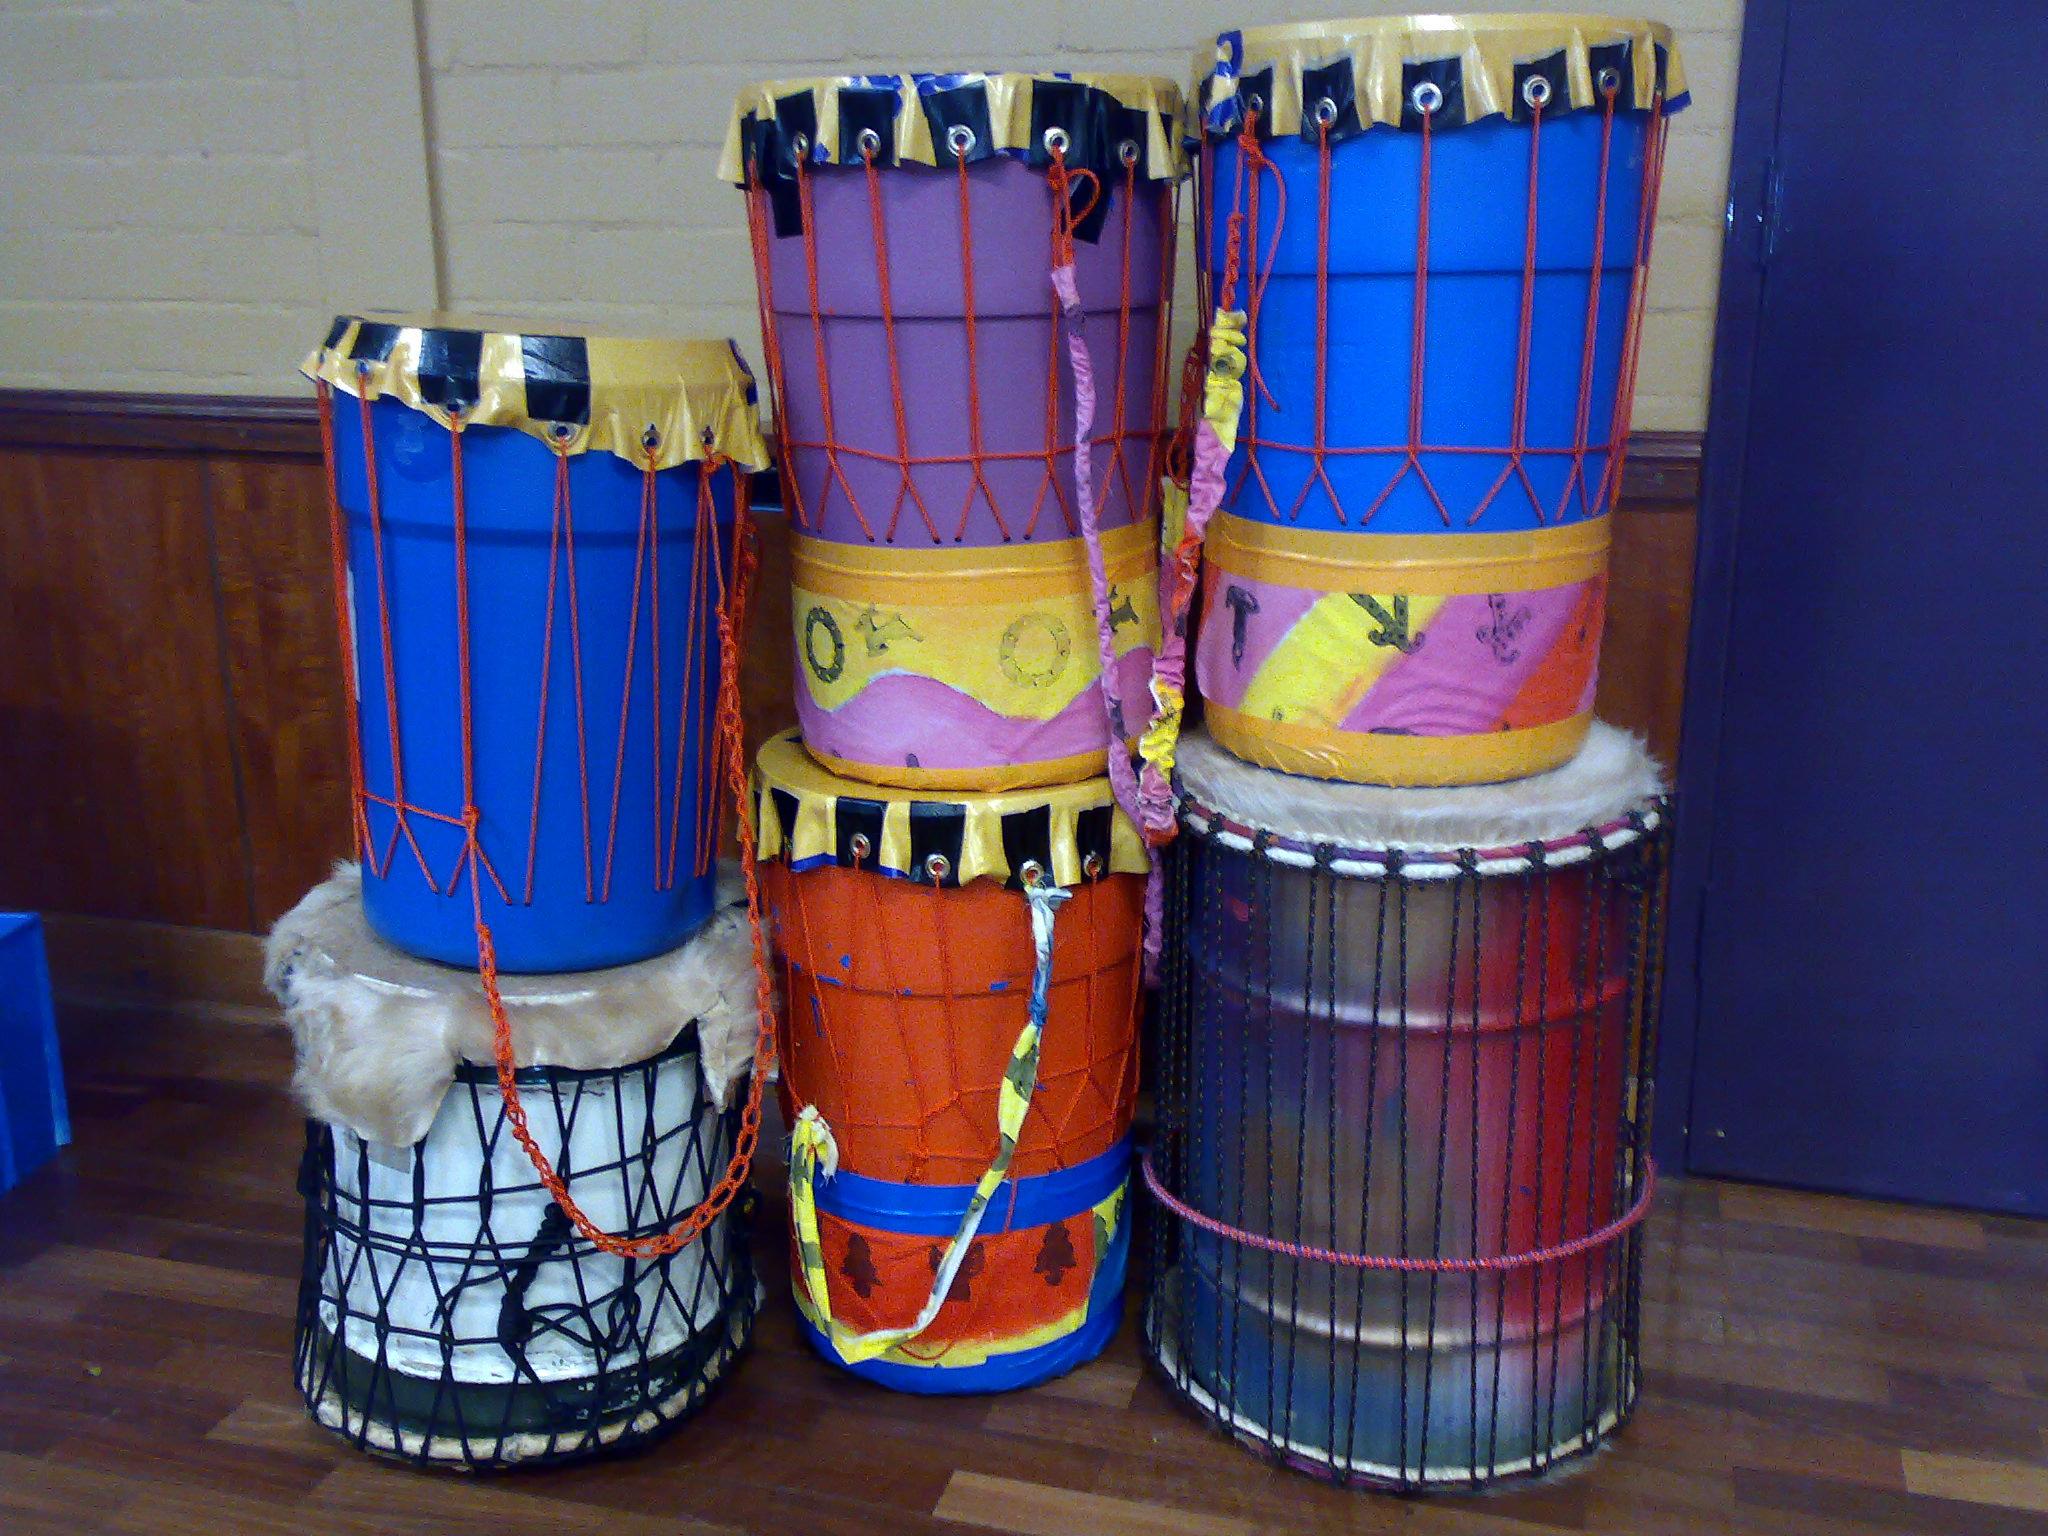 Rhythm, Drumming & Dance » RECYCLED DRUM MAKING